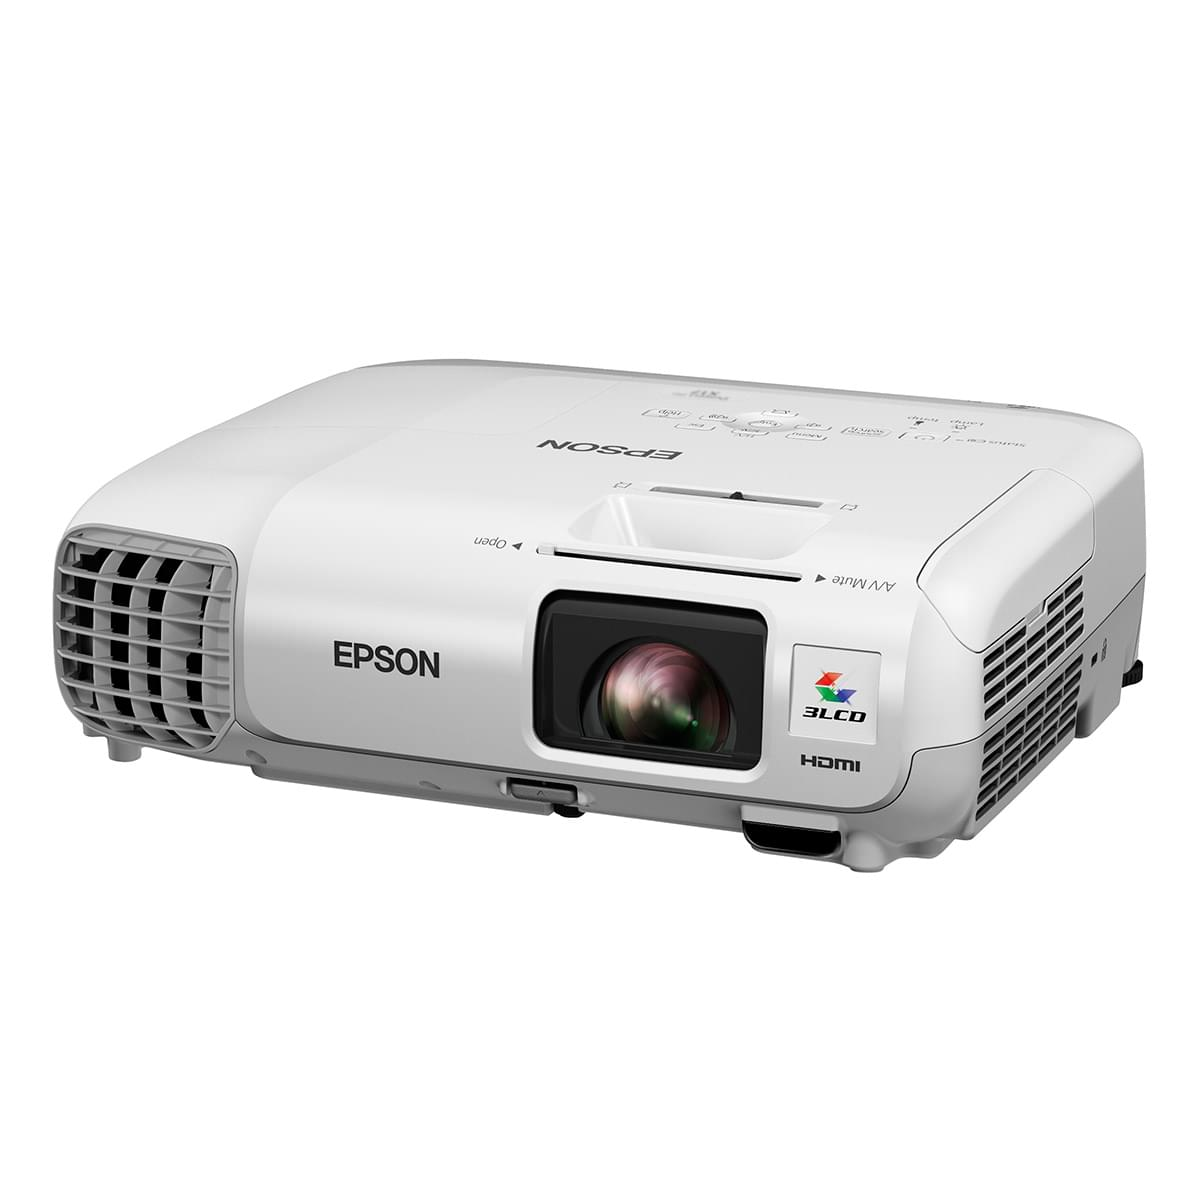 Epson EB-W22 - Vidéoprojecteur Epson - Cybertek.fr - 0